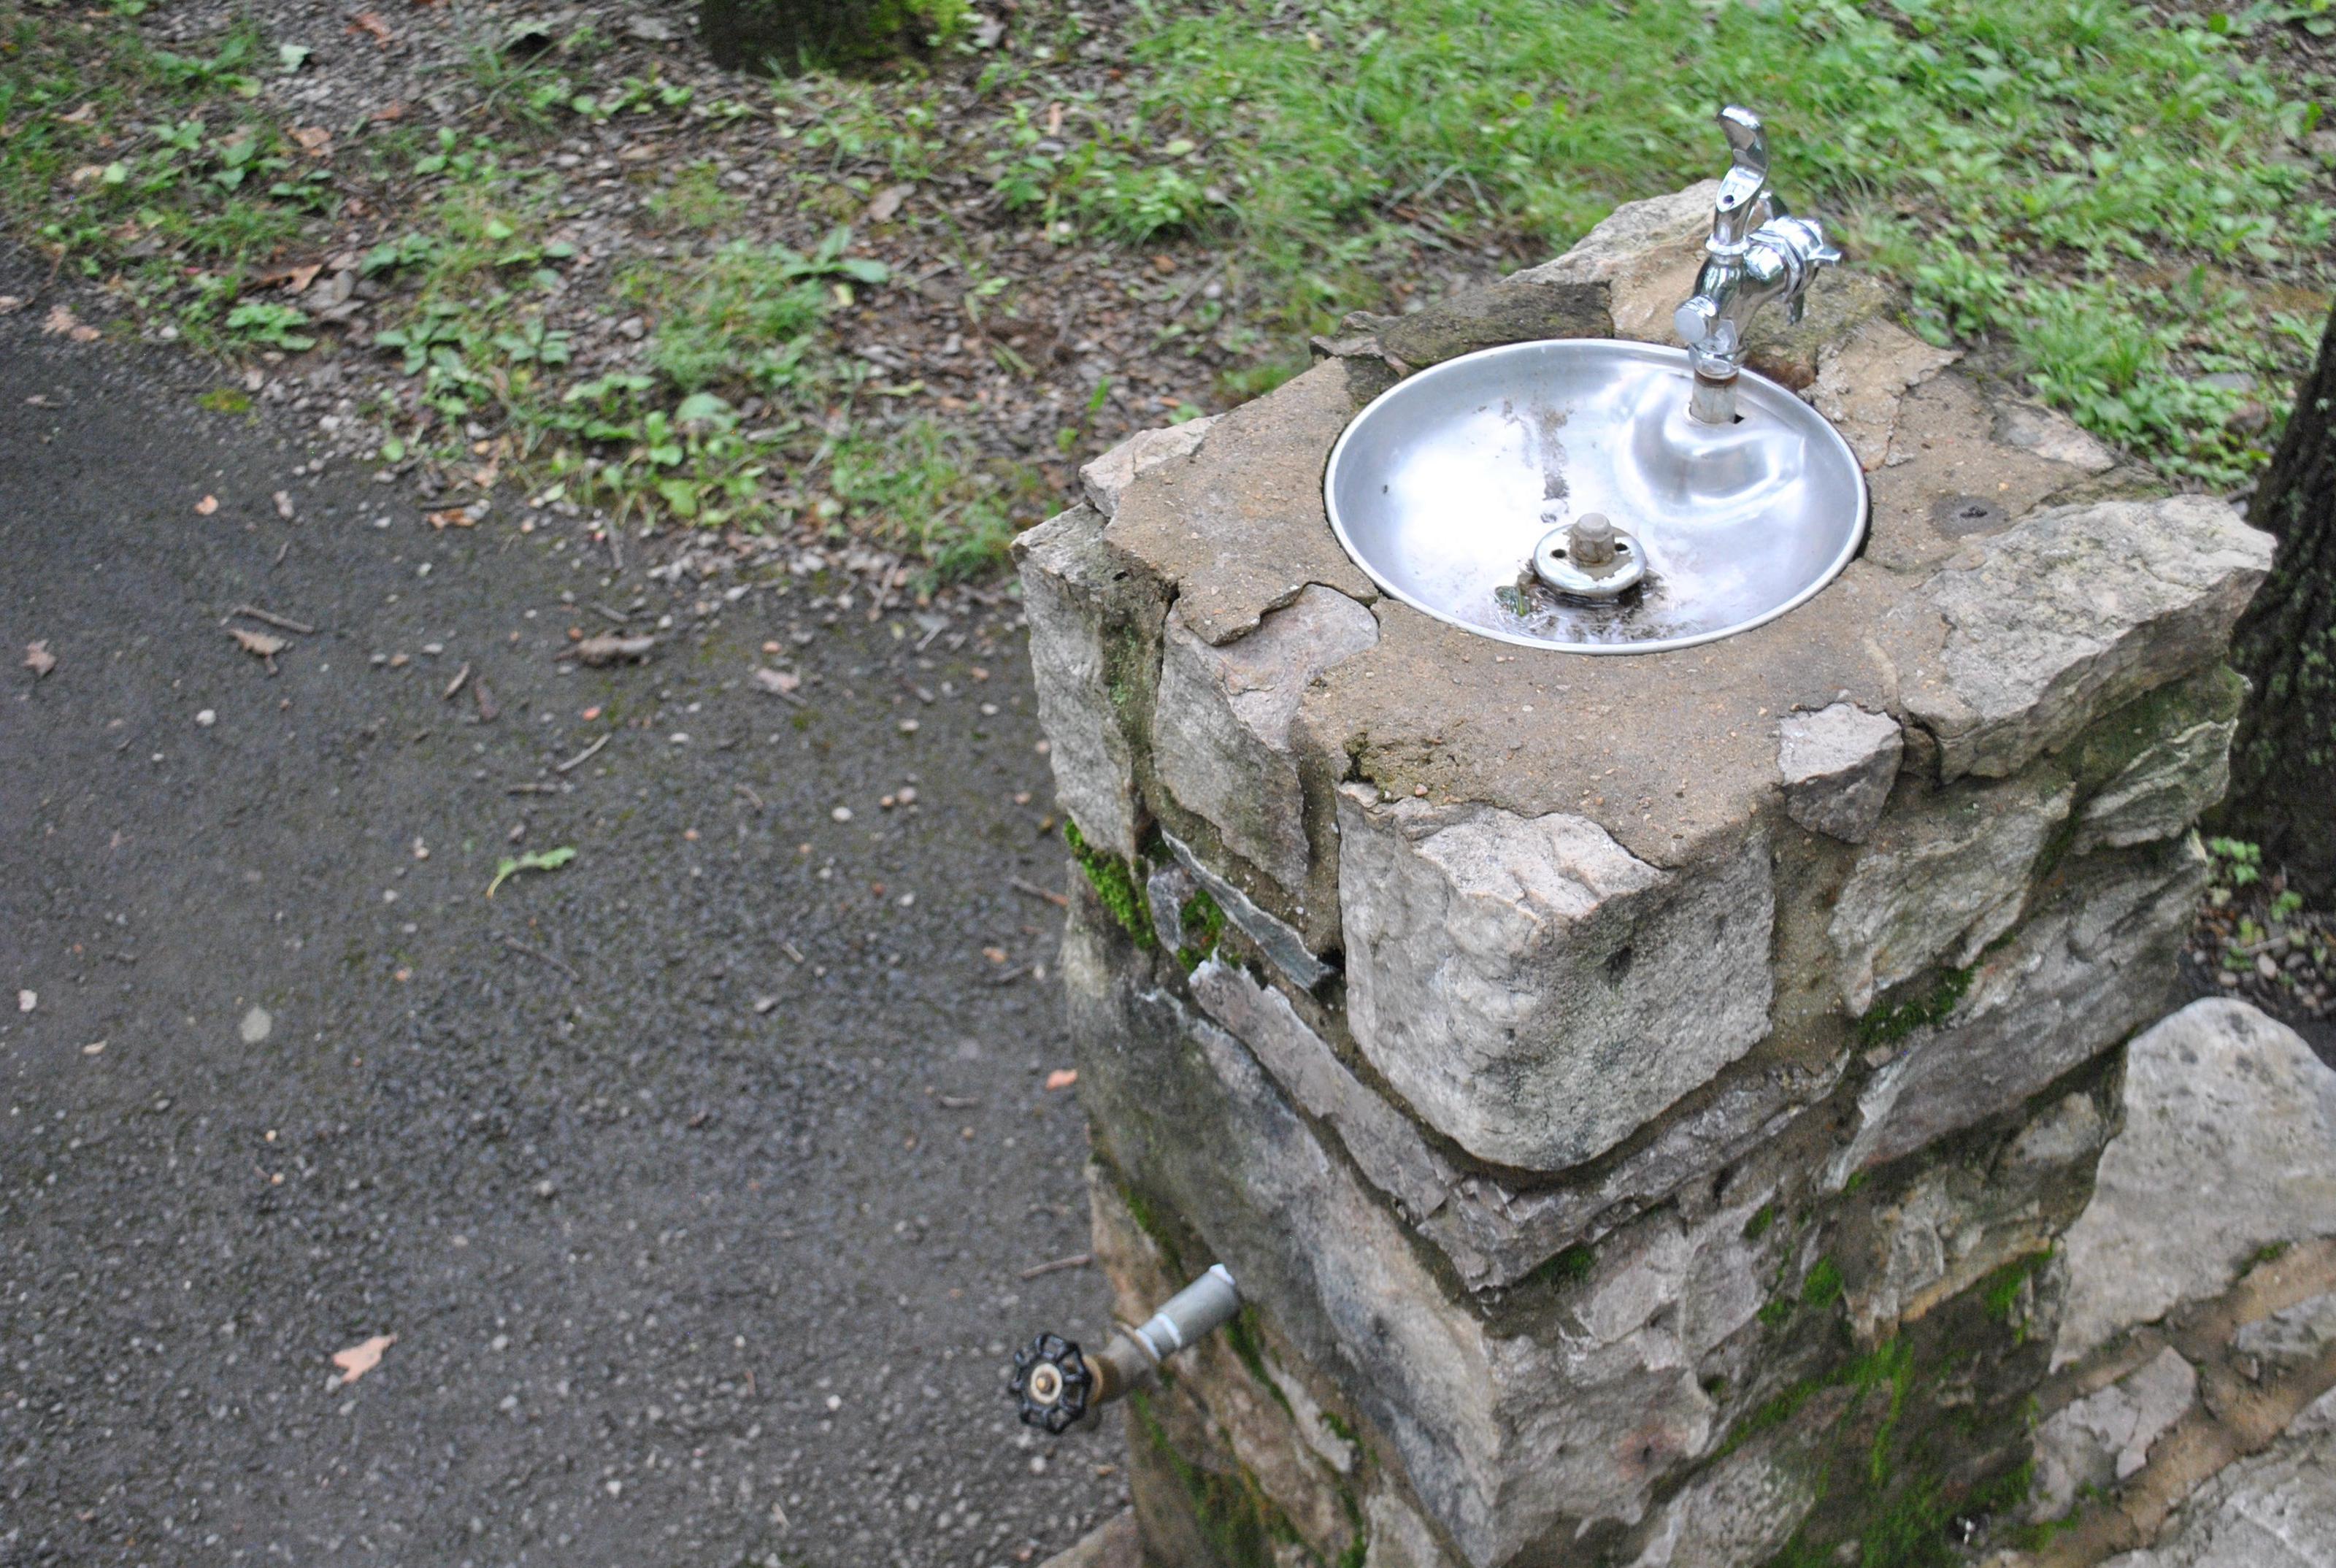 Mathews Arm Campground Water Fountain and Spigot